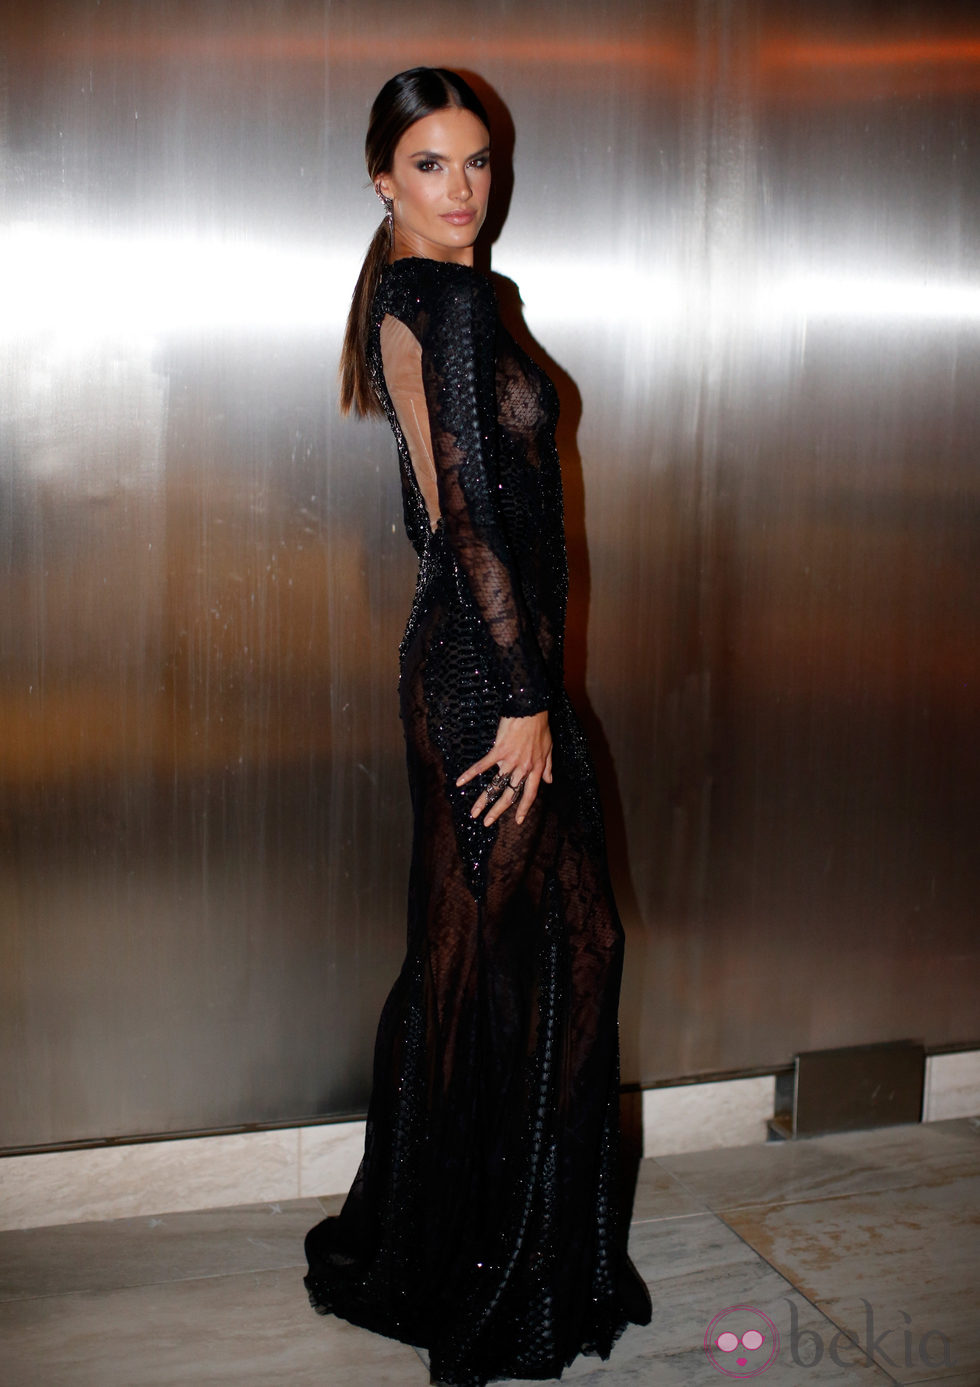 Alessandra Ambrosio en la 'AmfAR Inspiration Gala' 2014 en Hollywood